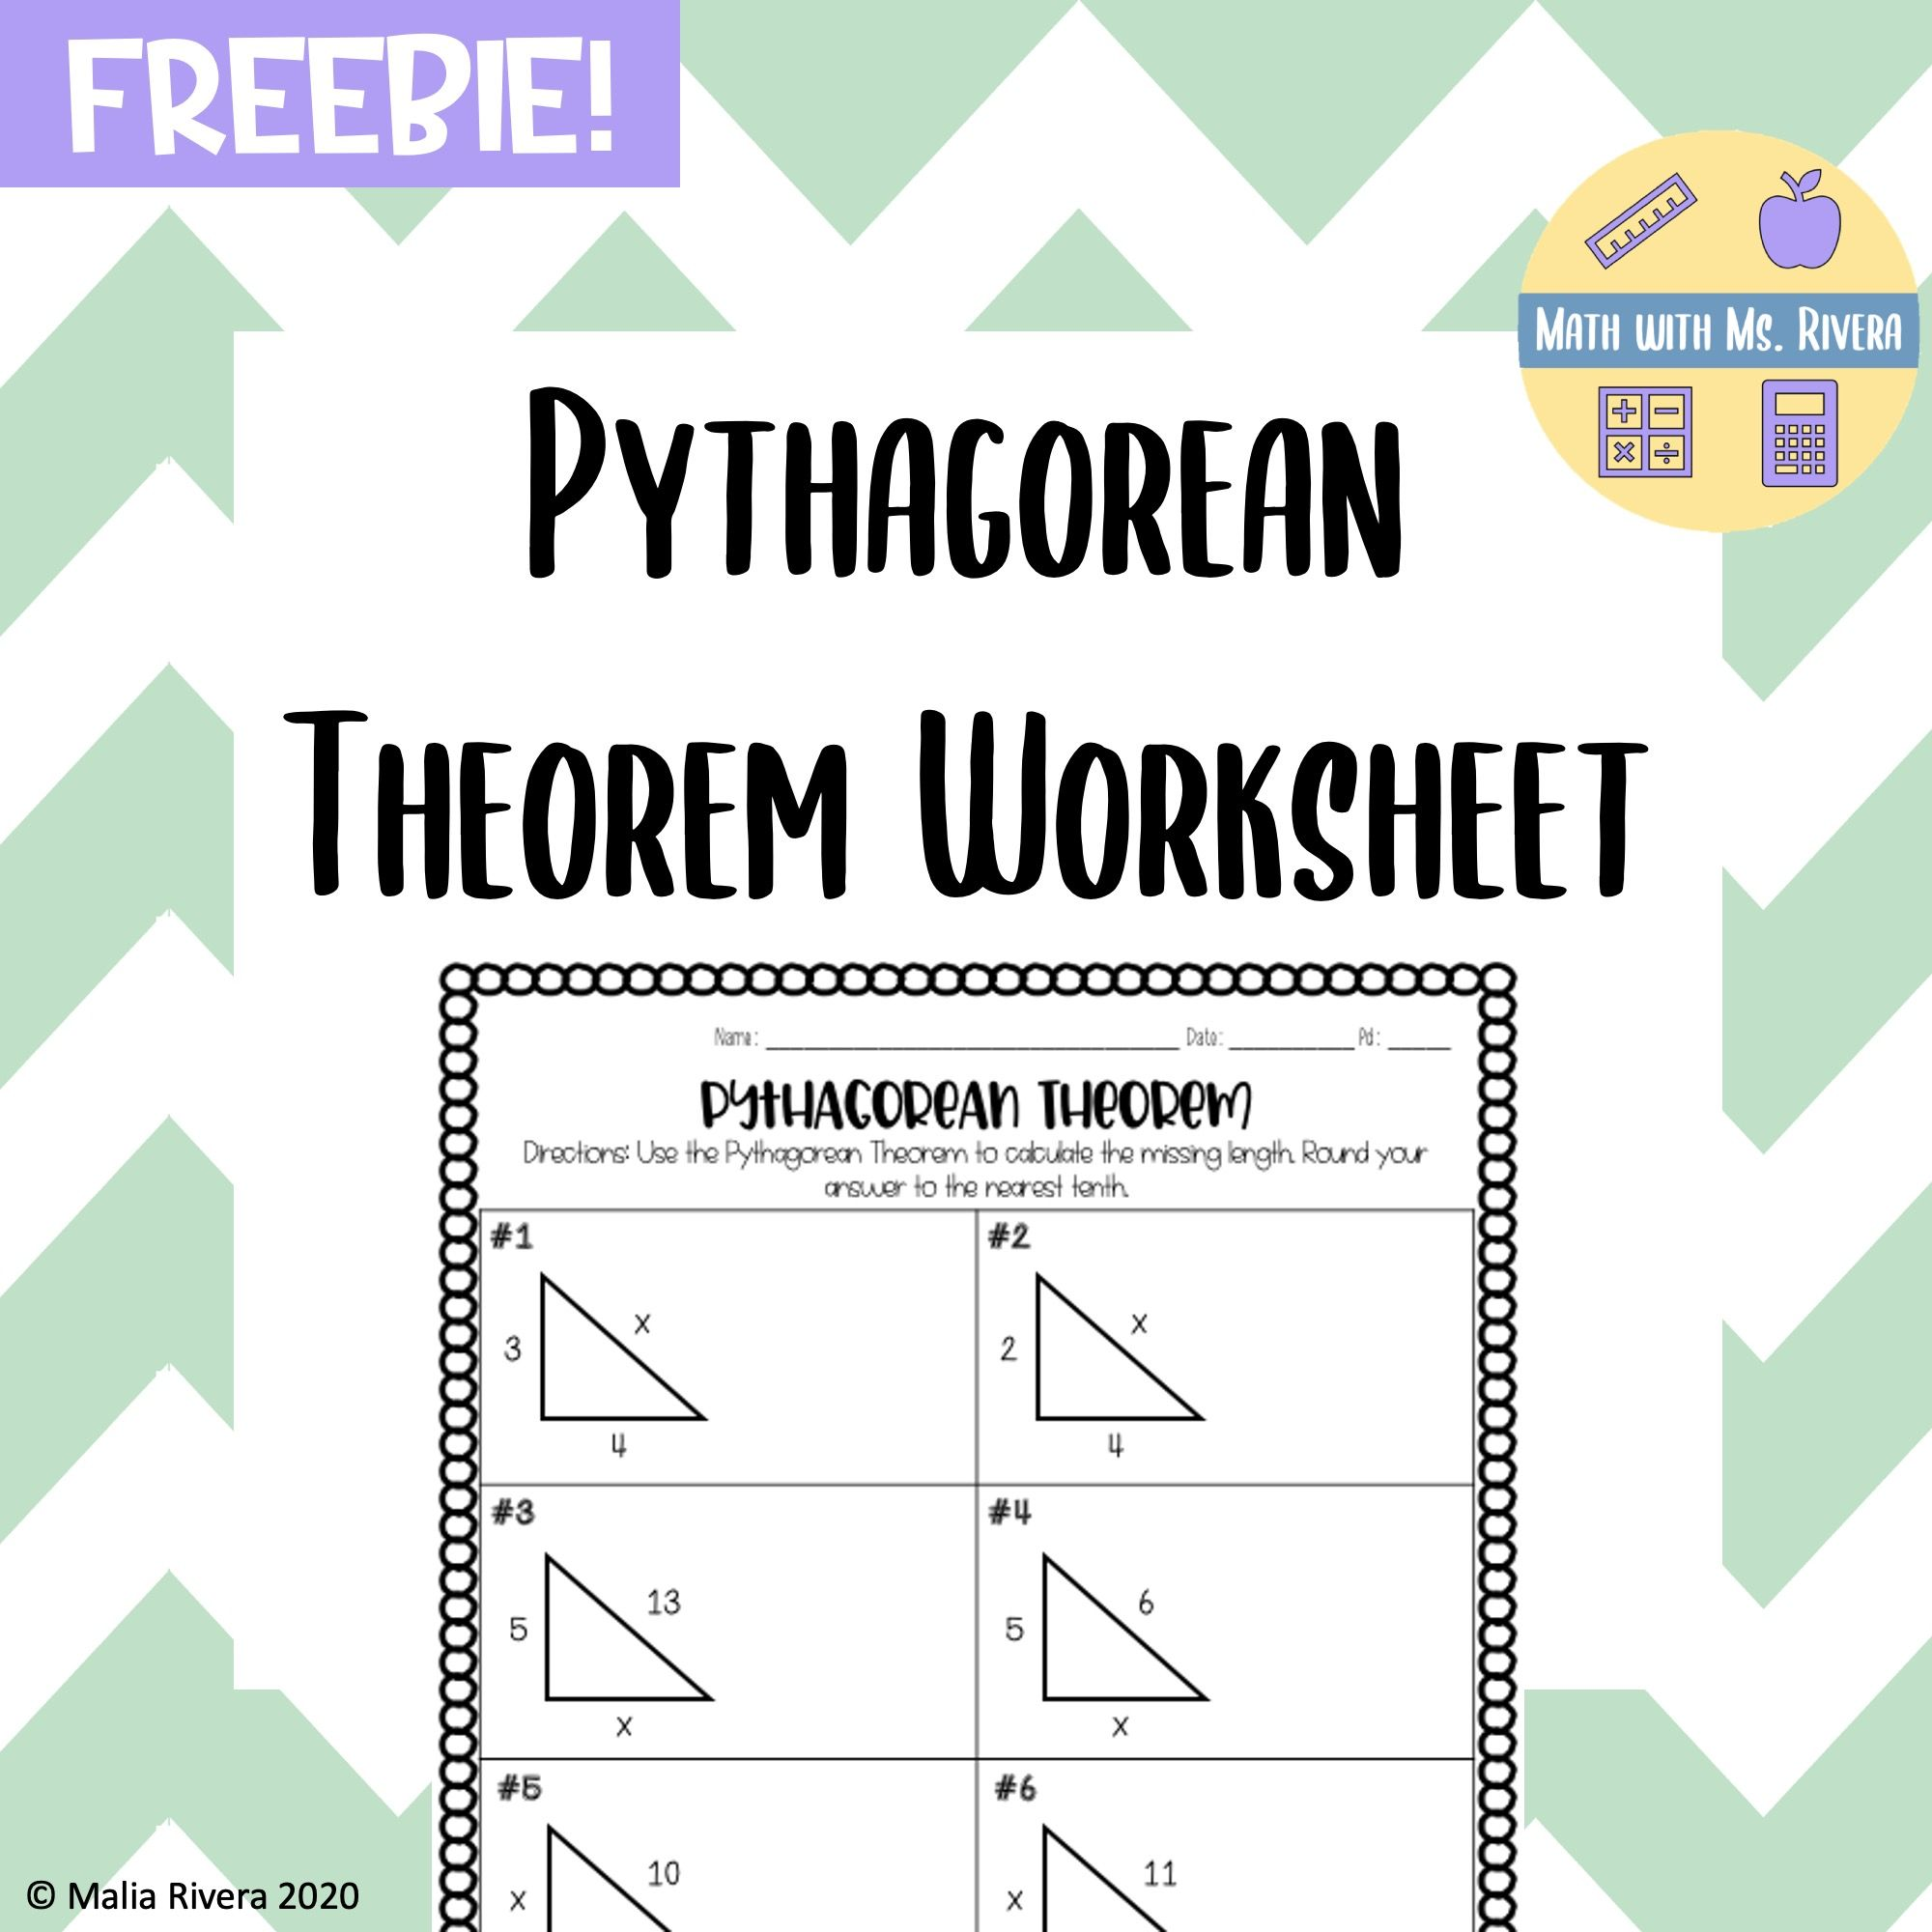 Pythagorean Theorem Worksheet - FREEBIE   Pythagorean theorem worksheet [ 2000 x 2000 Pixel ]